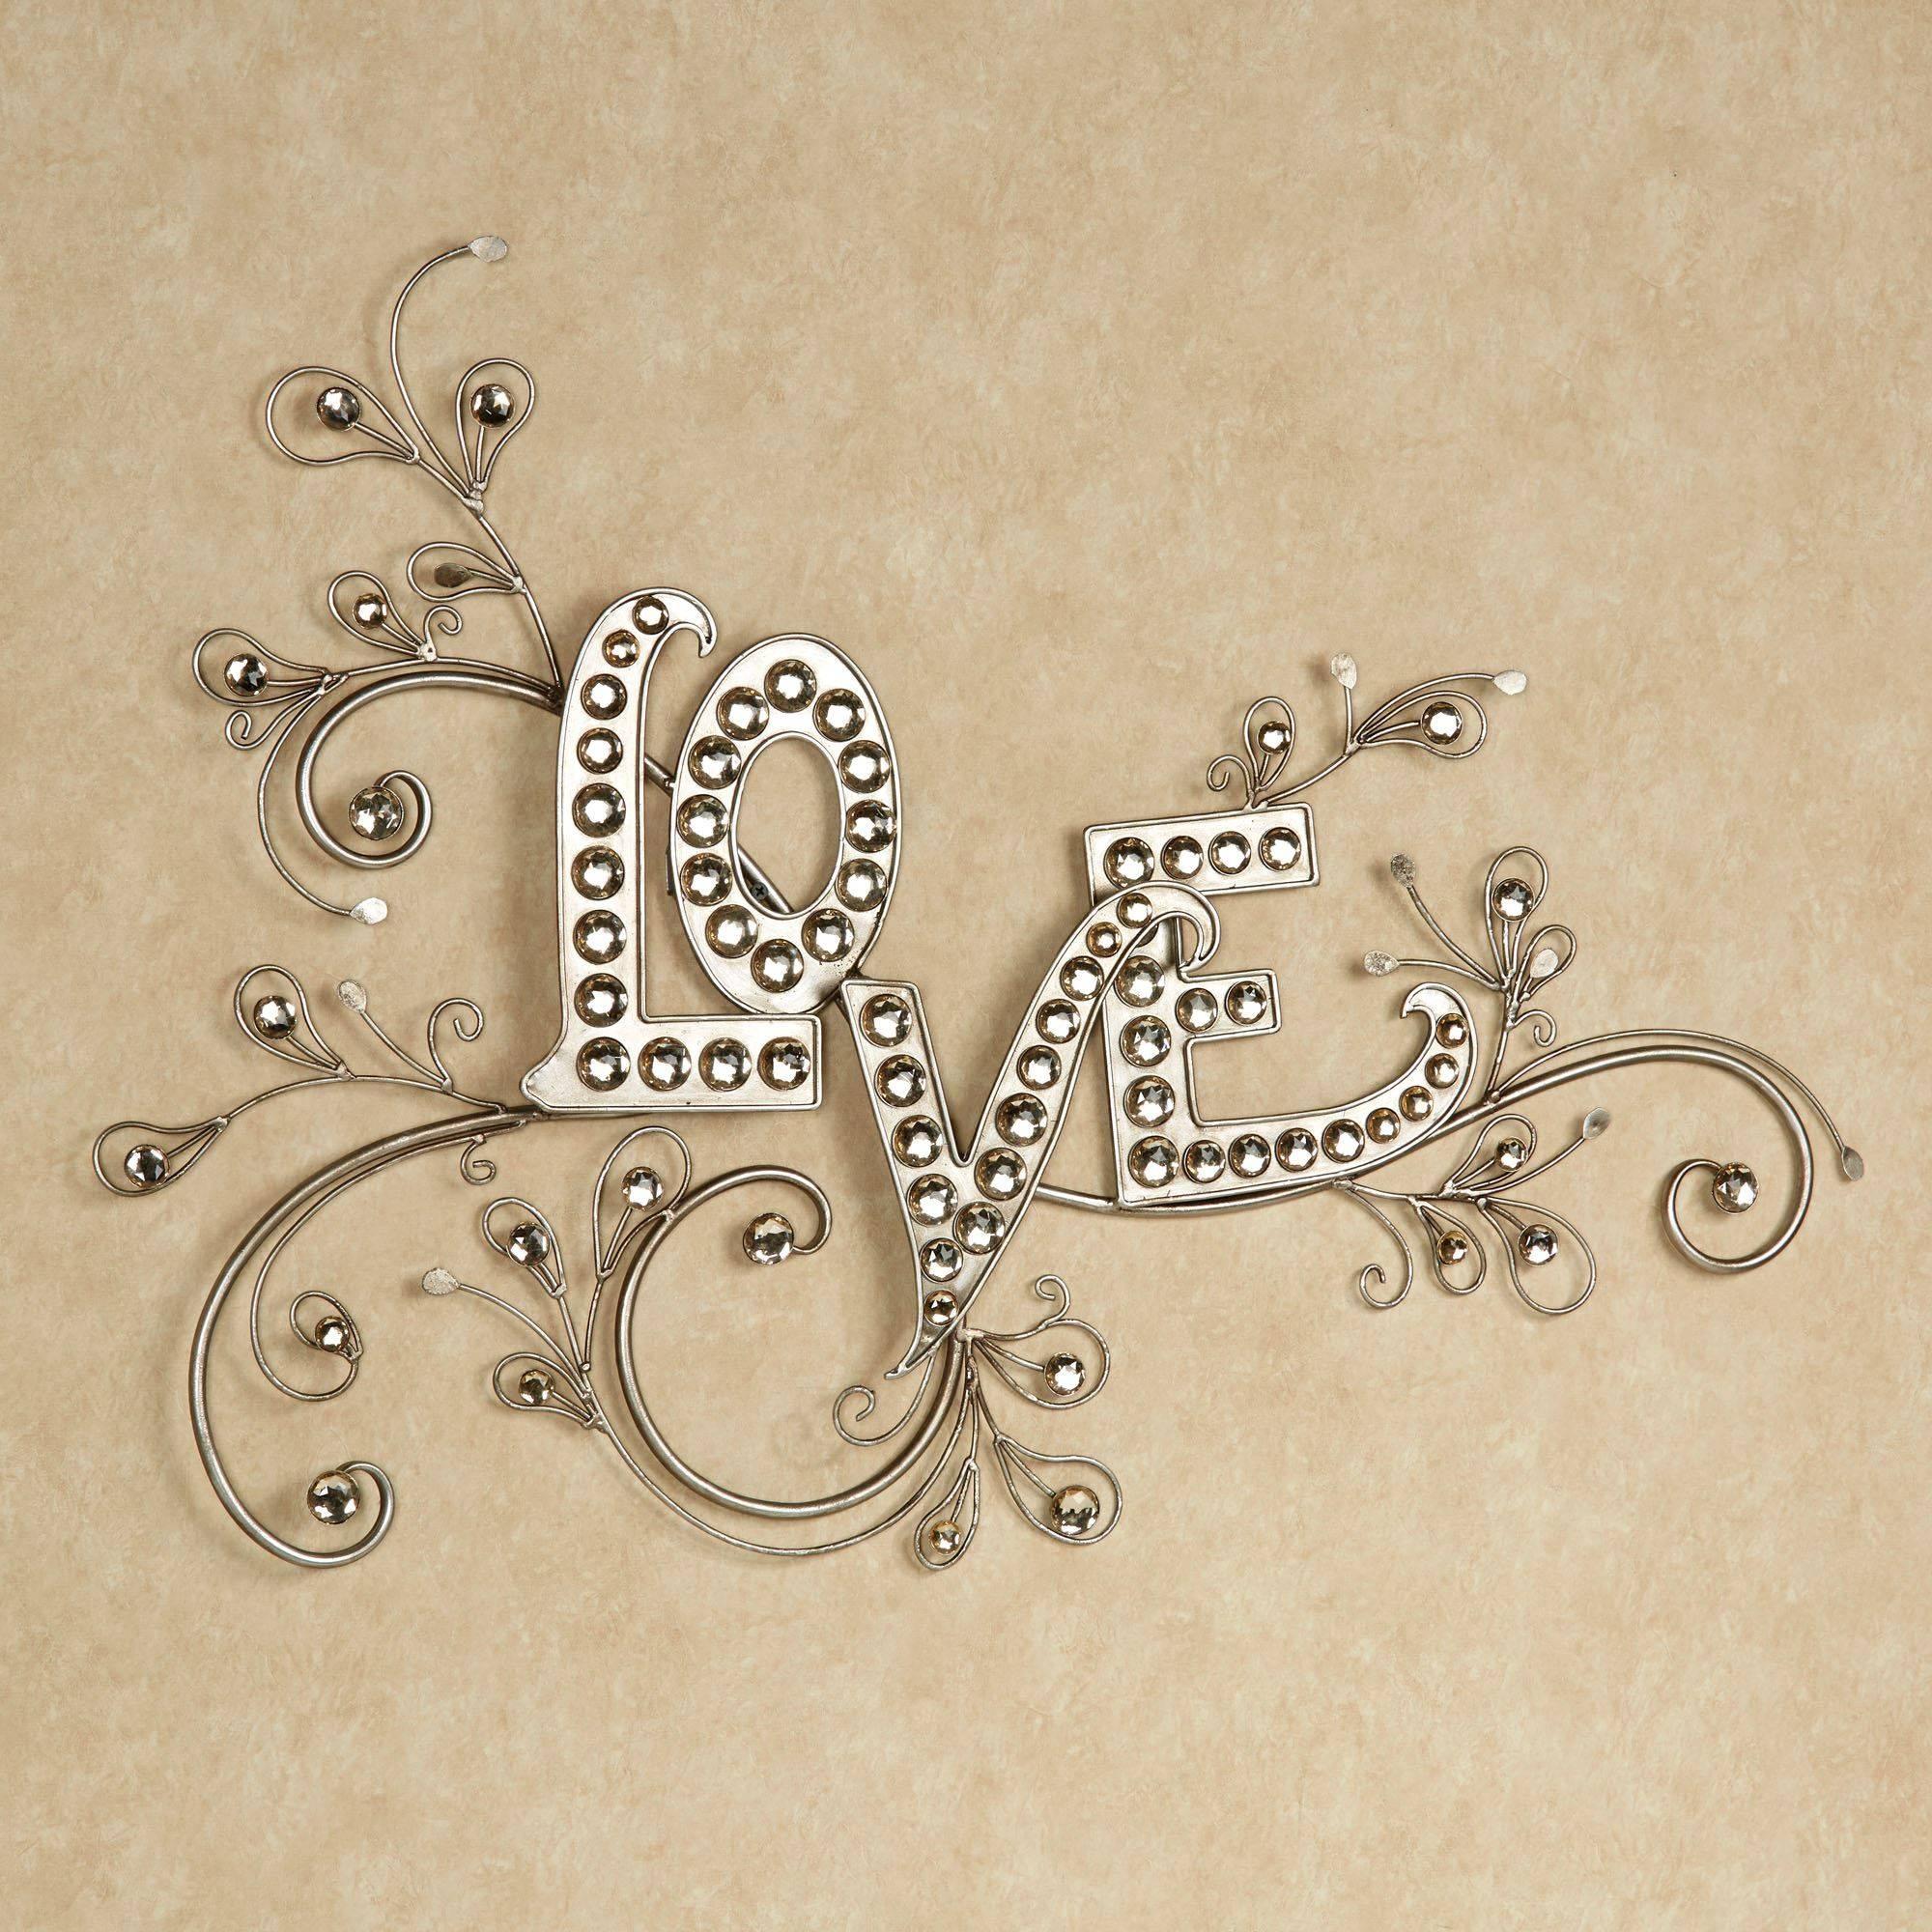 Sparkling Love Gem Word Wall Art Regarding Most Current Metal Wall Art Words (View 12 of 20)